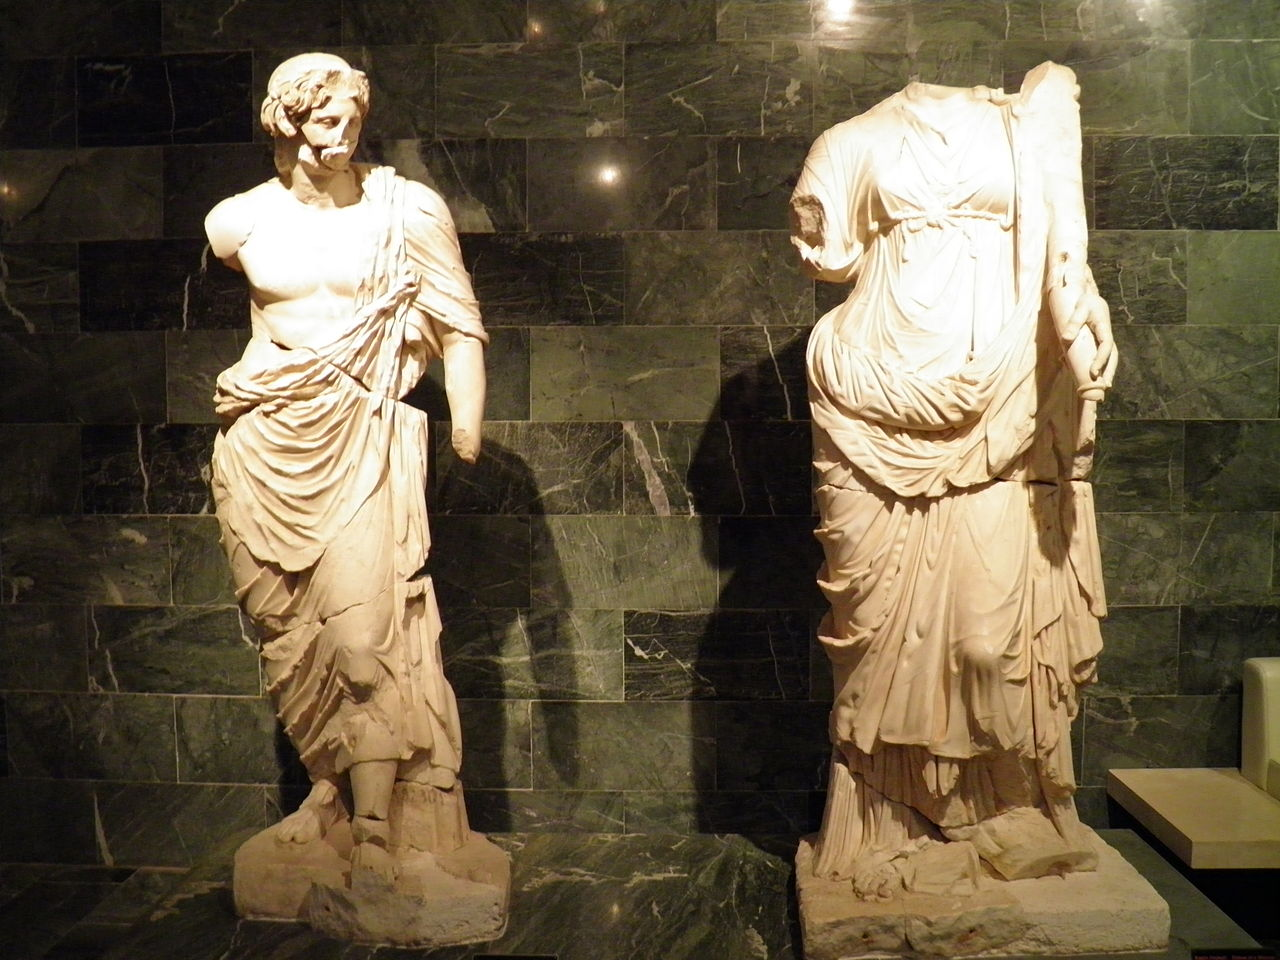 М�зей Ан�алии �к�пози�ии ад�е� �еле�он� в�емя �або��